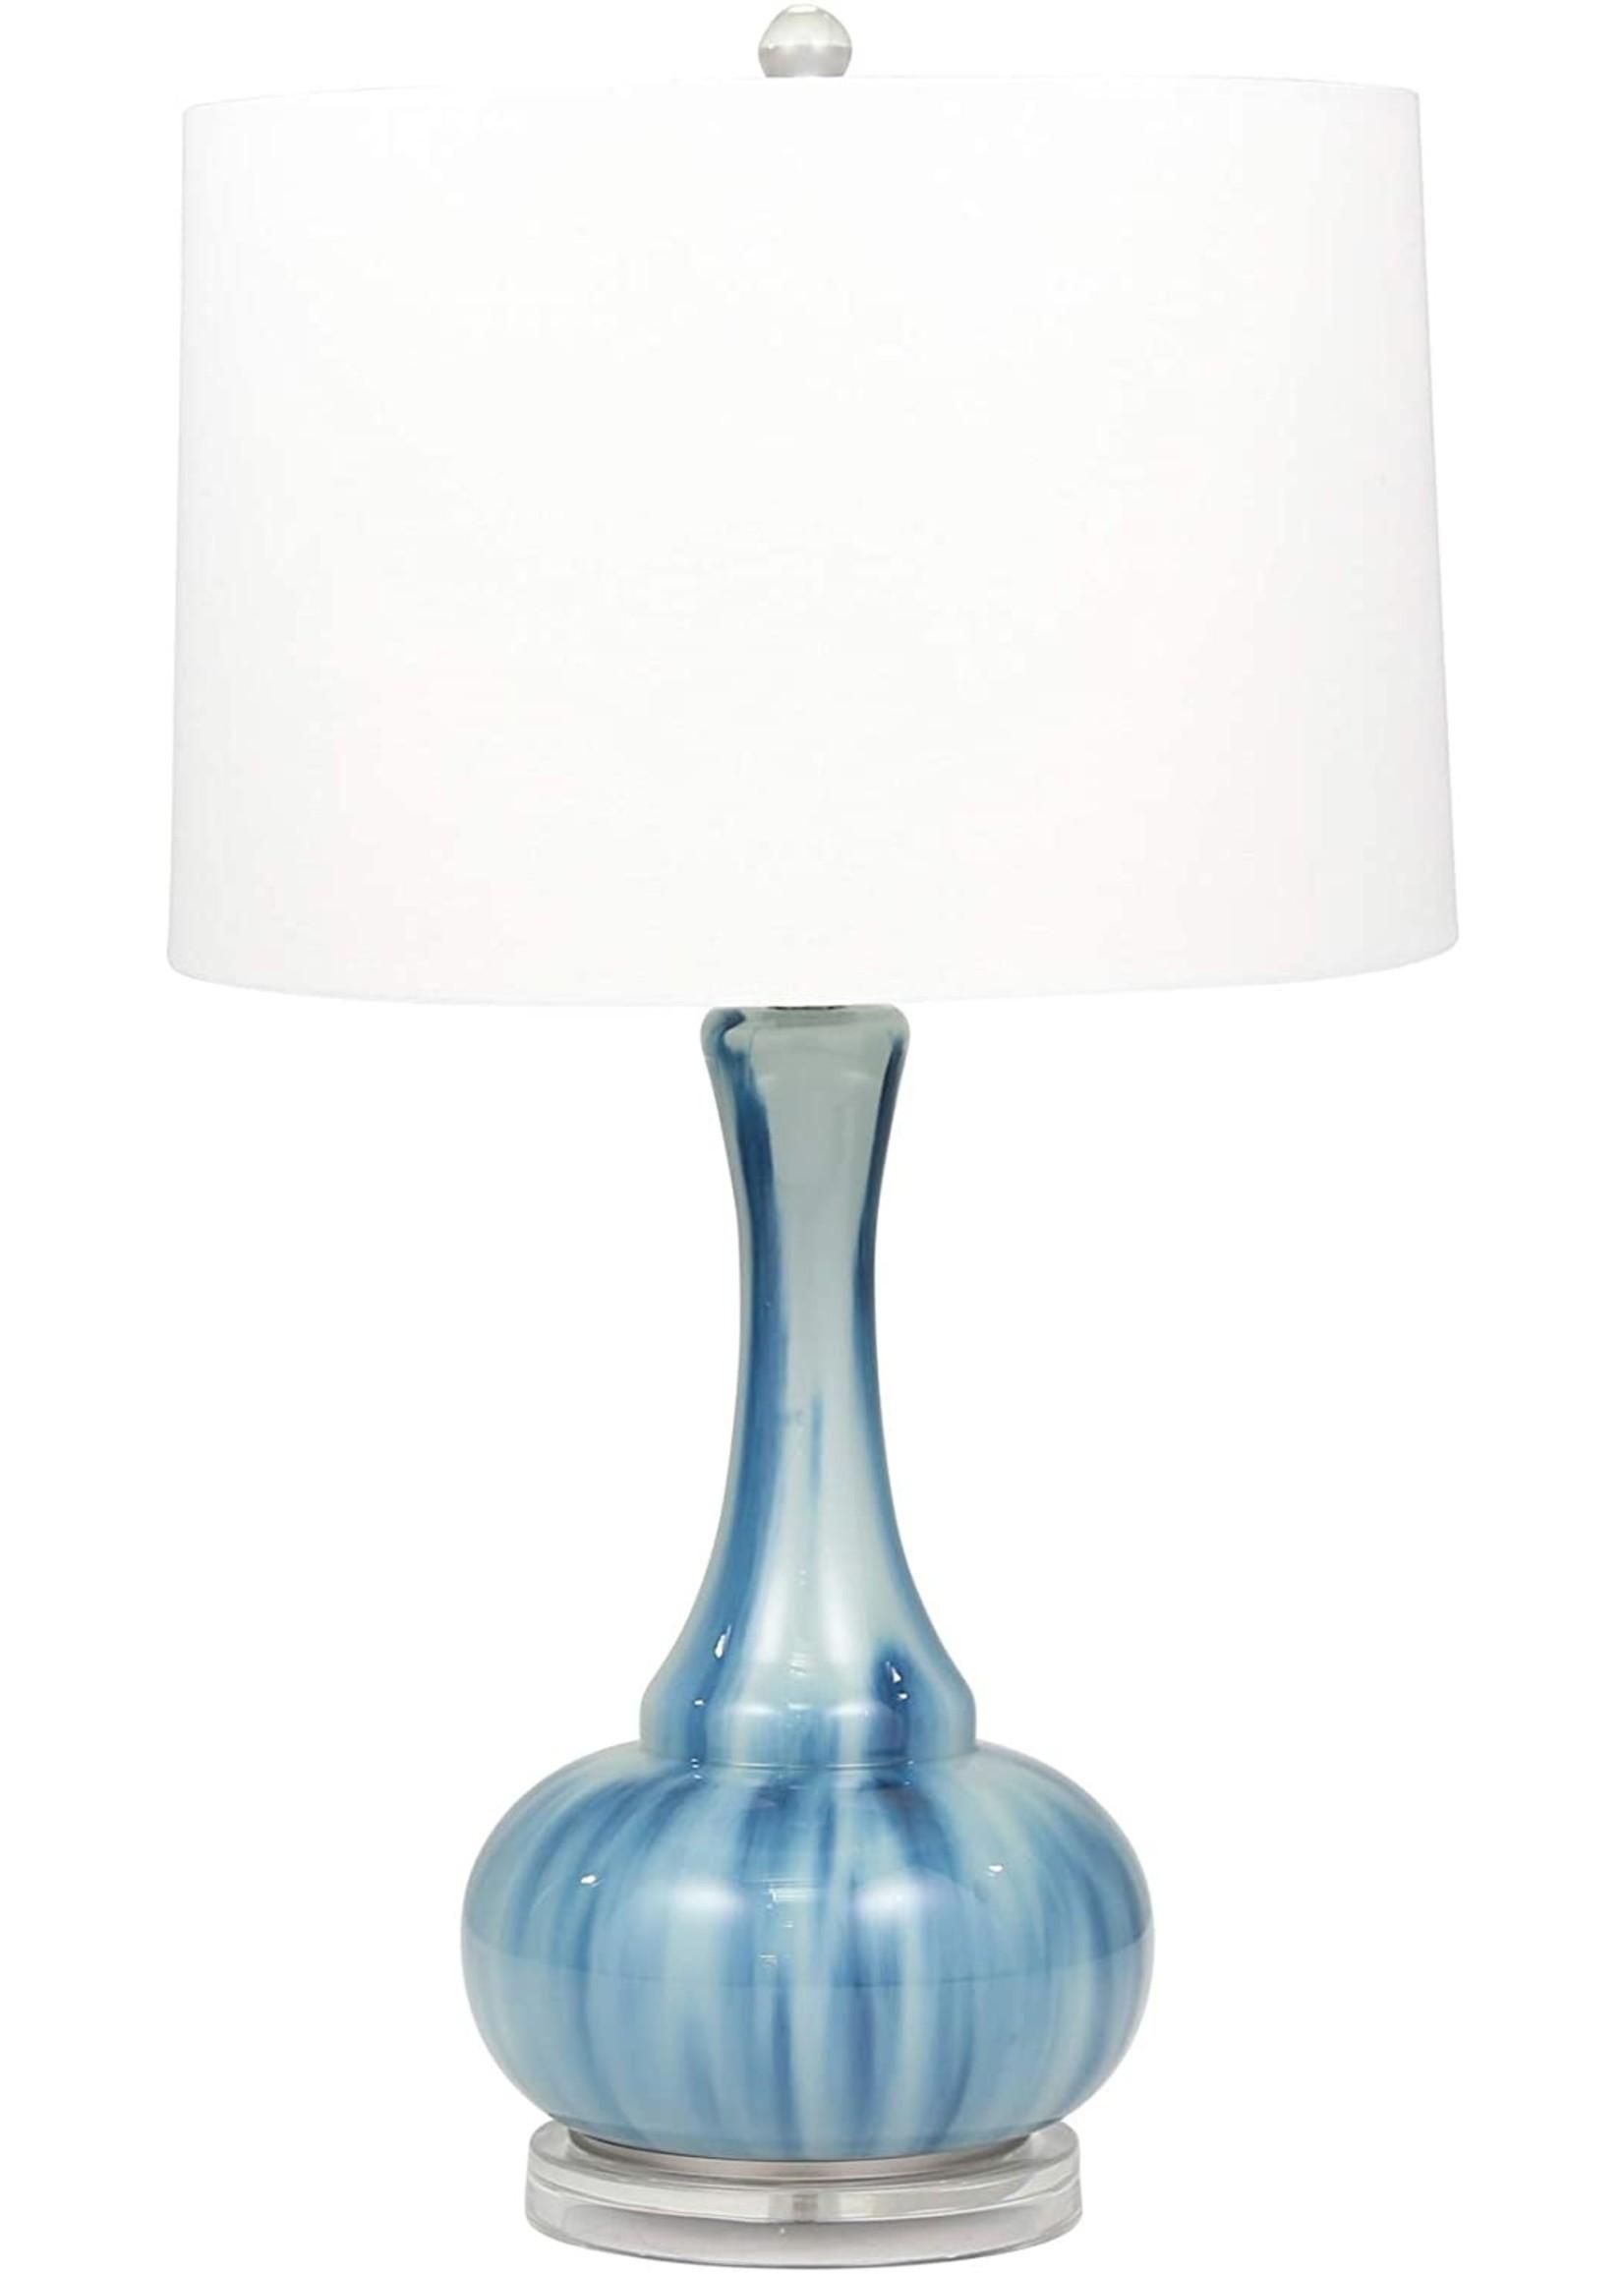 Sagebrook Home Glass Genie Bottle Table Lamp Blue